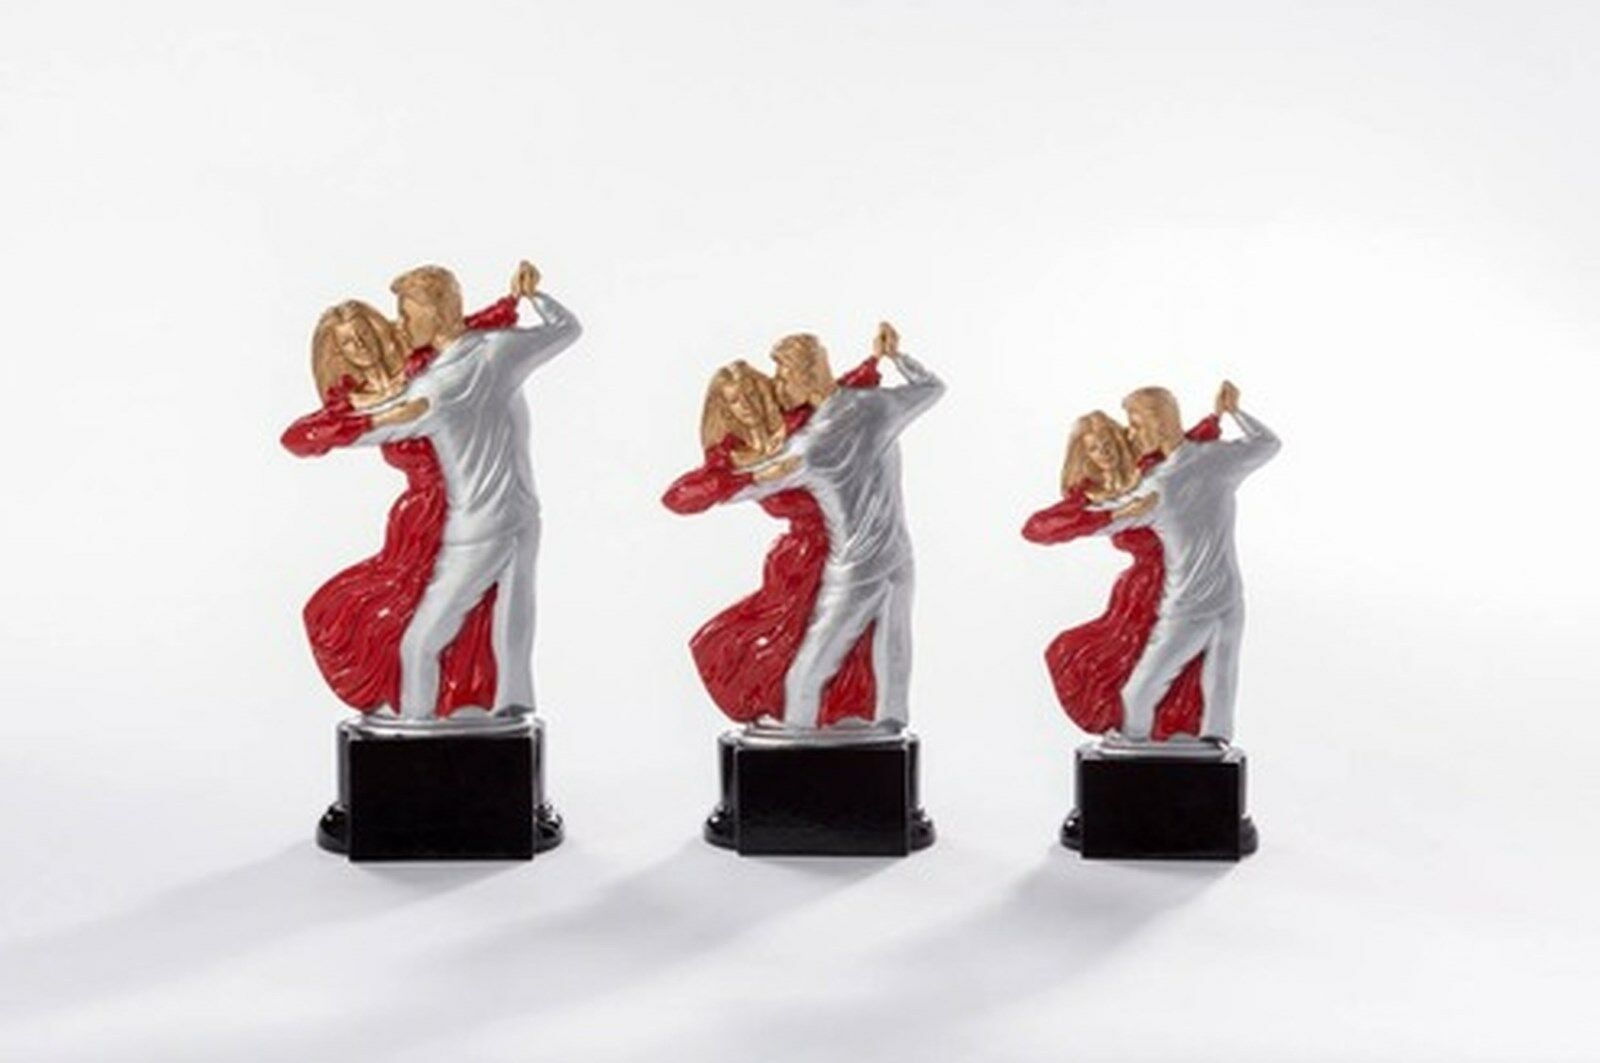 6 Figuren Tanzen 3er Serie aus Resin mit mit mit Gravur (Standard Turnier Pokale Pokal) 9e0e09